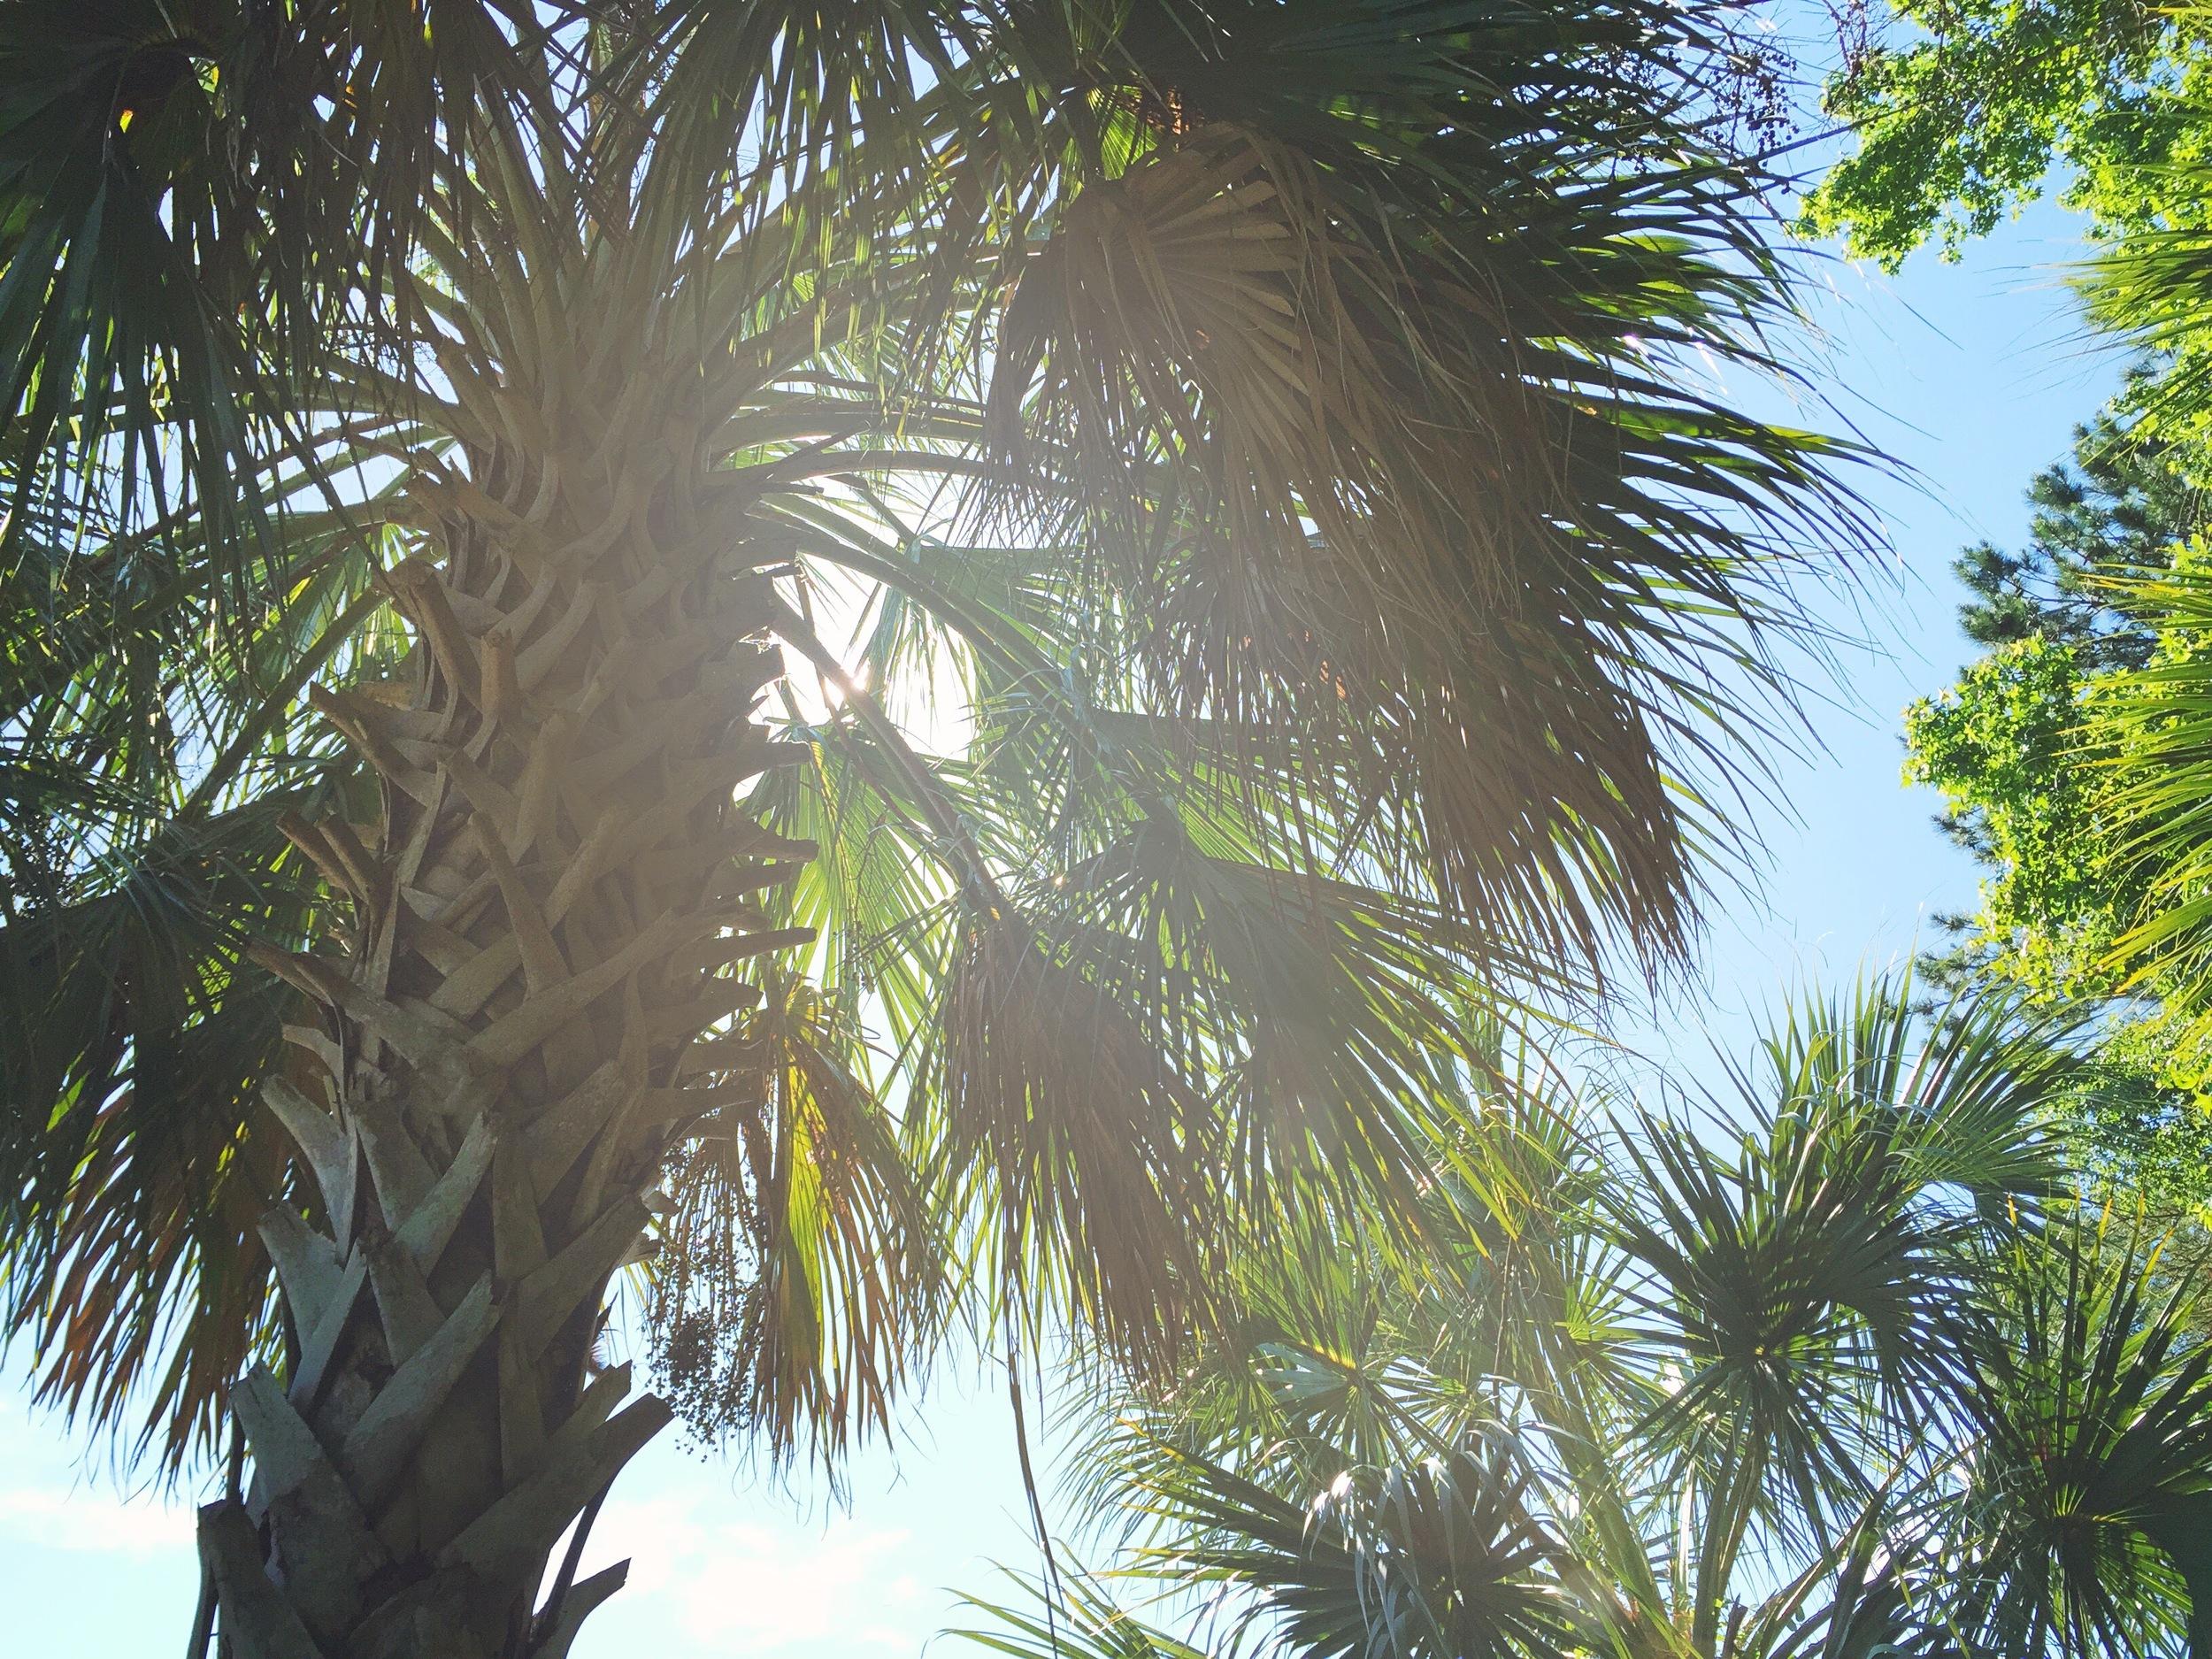 palm-trees-beach-life